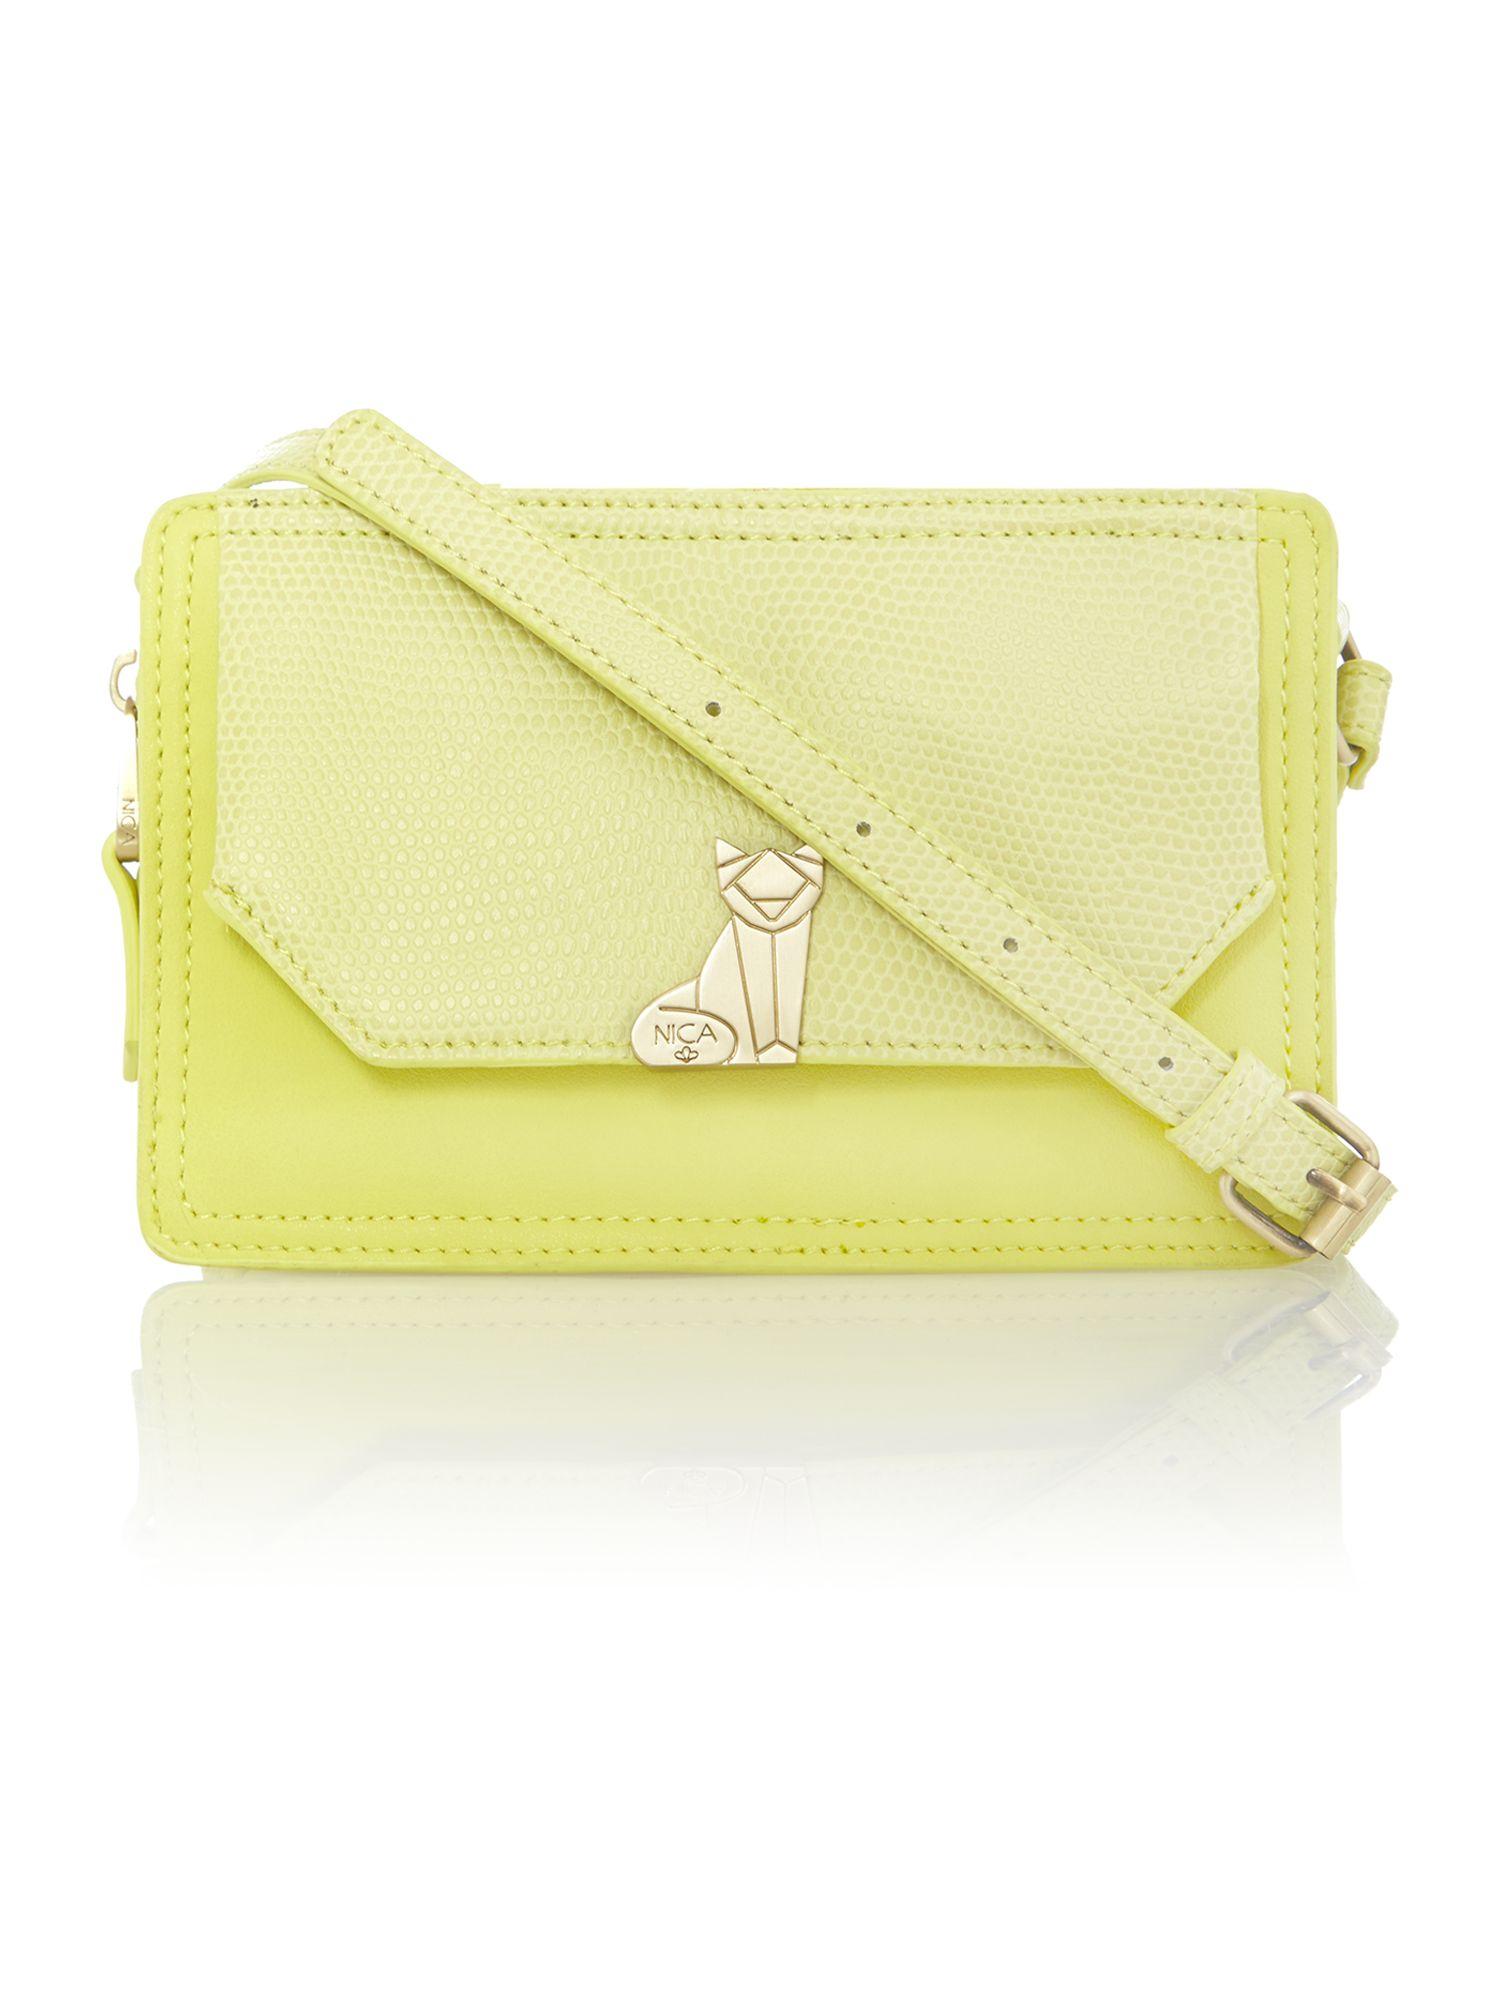 Nica Venice Yellow Crossbody Bag in Pink